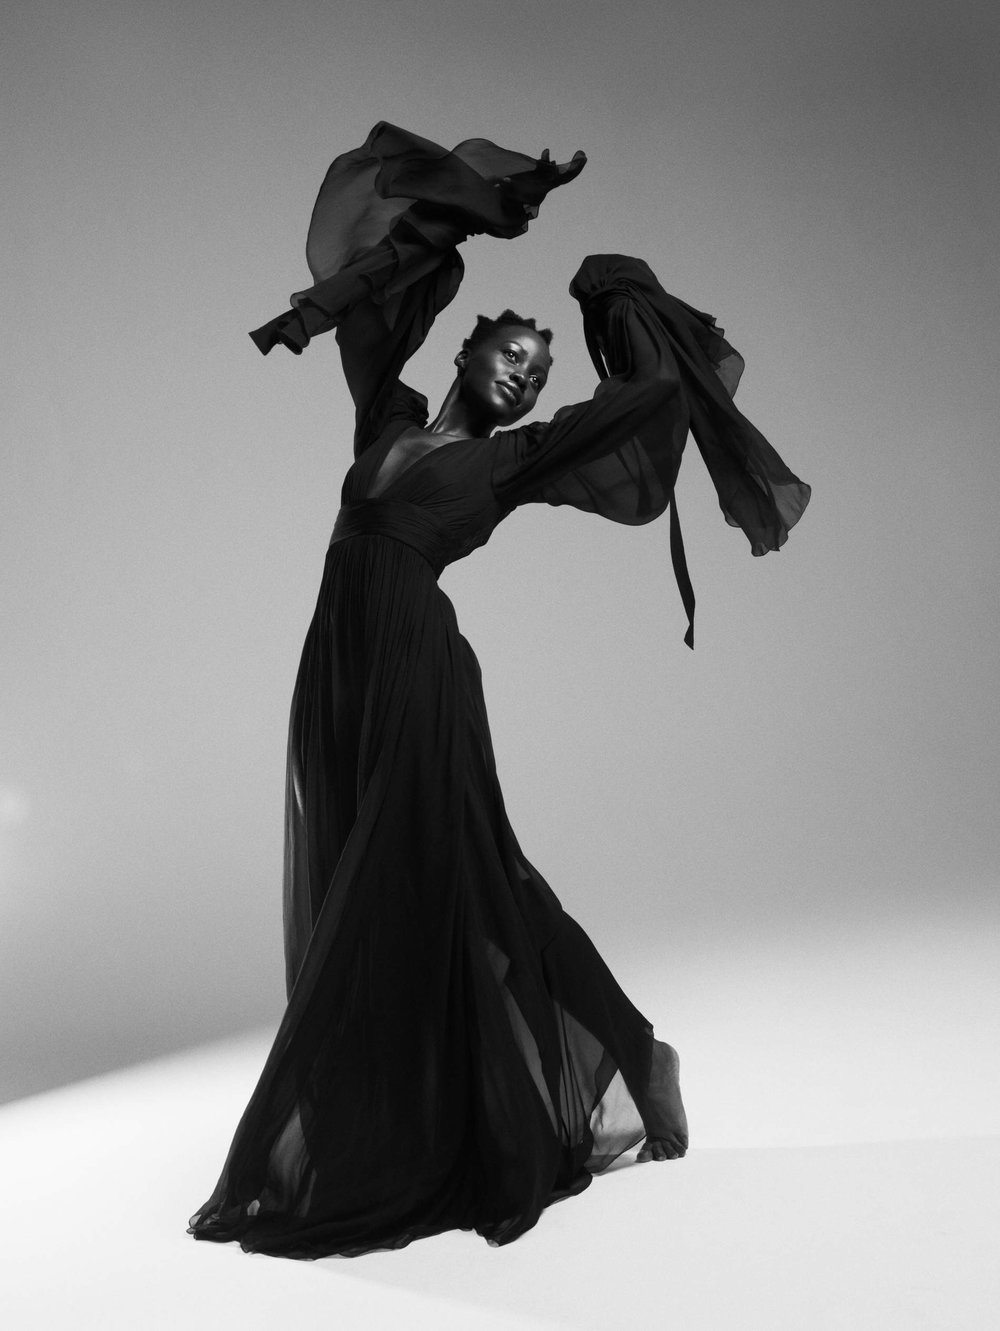 Lupita-Nyong'o-Paola-Kudacki-Porter-Edit (10).jpeg